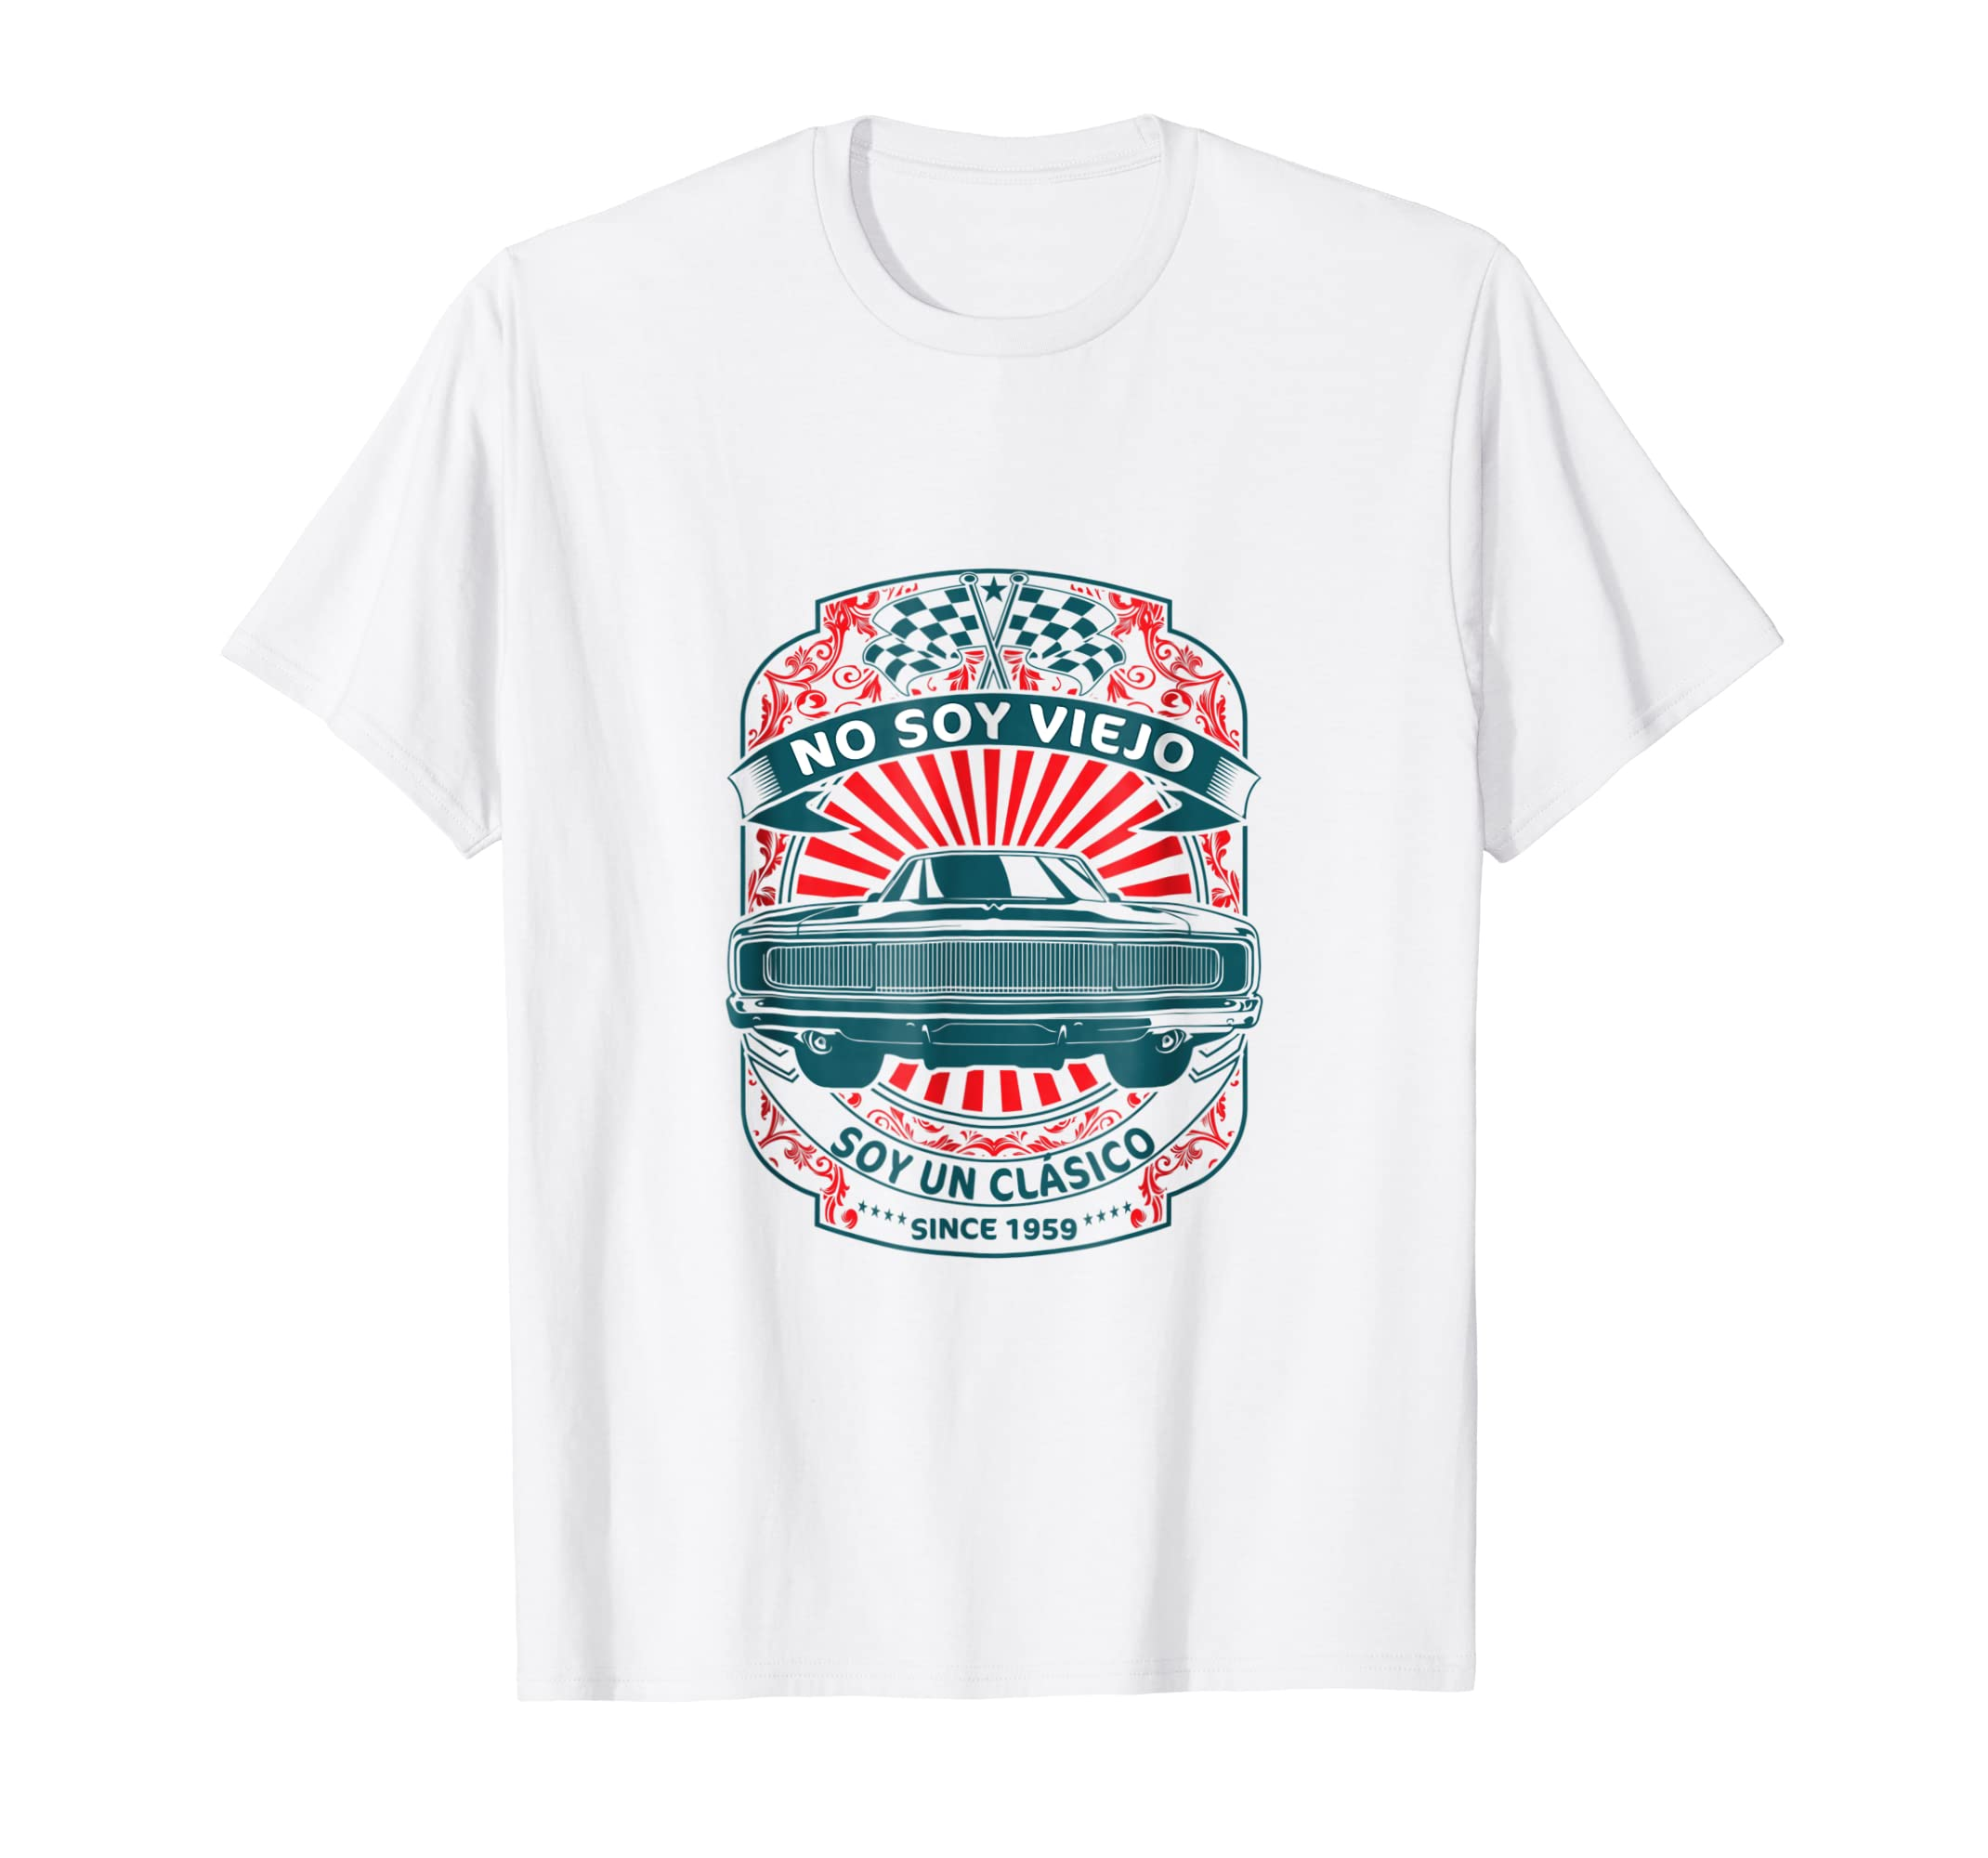 Amazon.com: Camiseta No Soy Viejo Soy Clasico Cumpleanos 60 ...